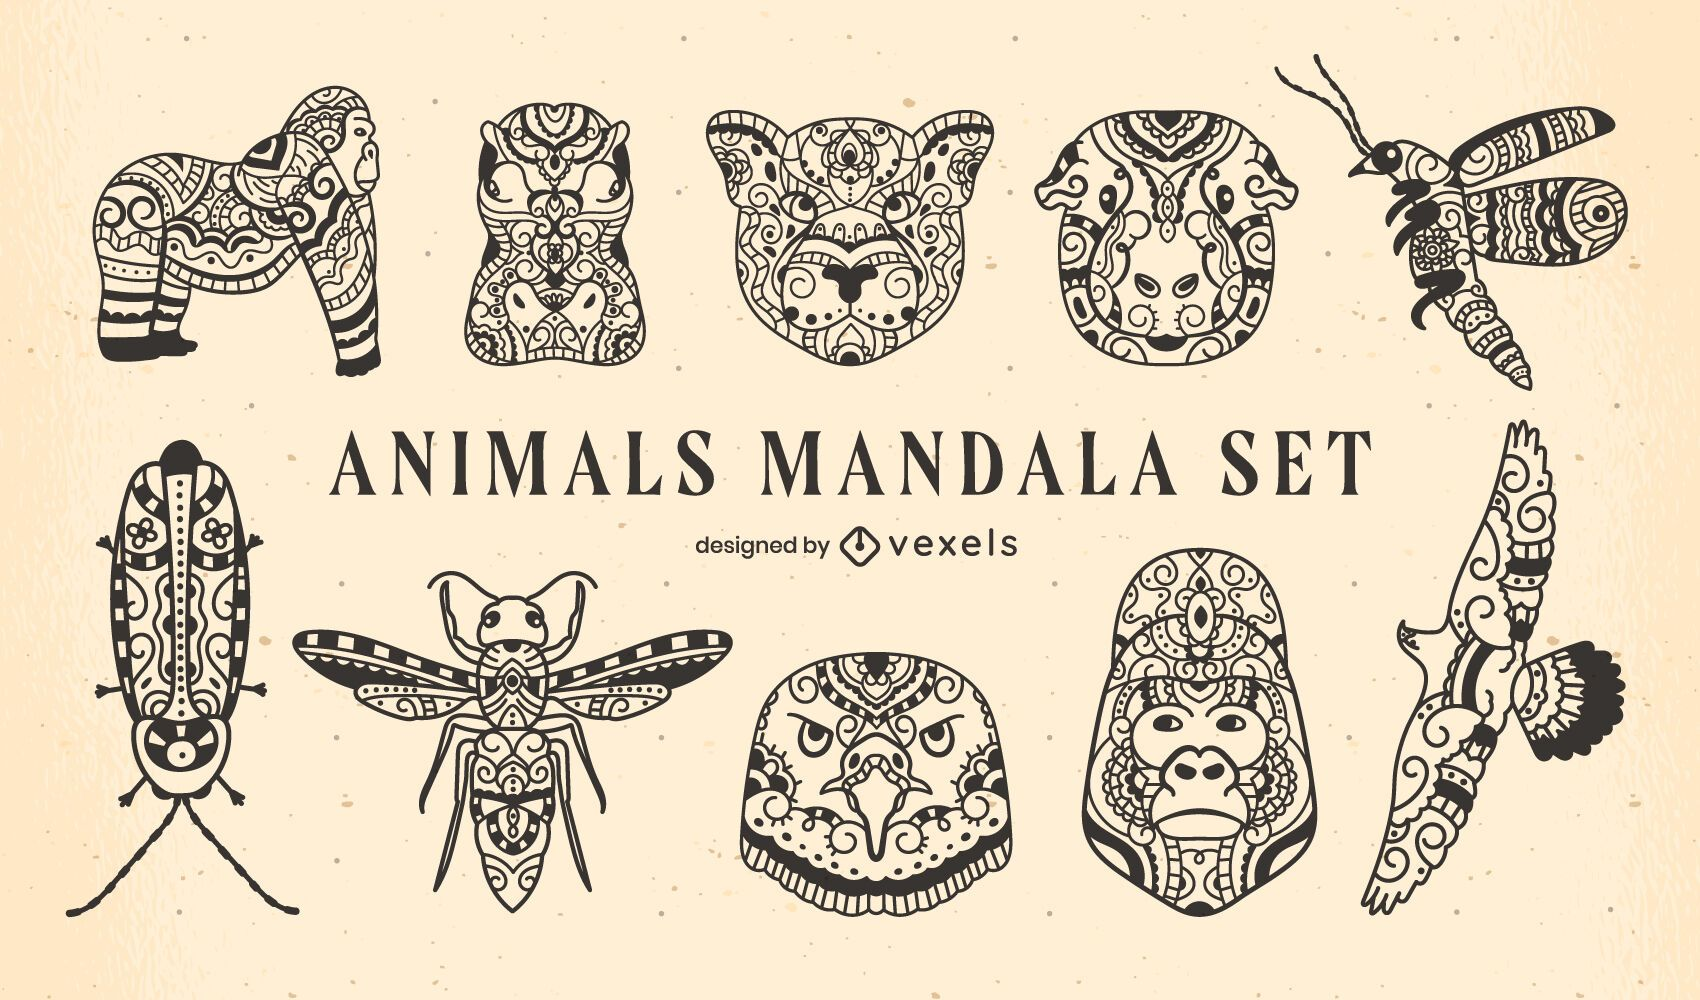 Conjunto de animais de mandala preenchido curso